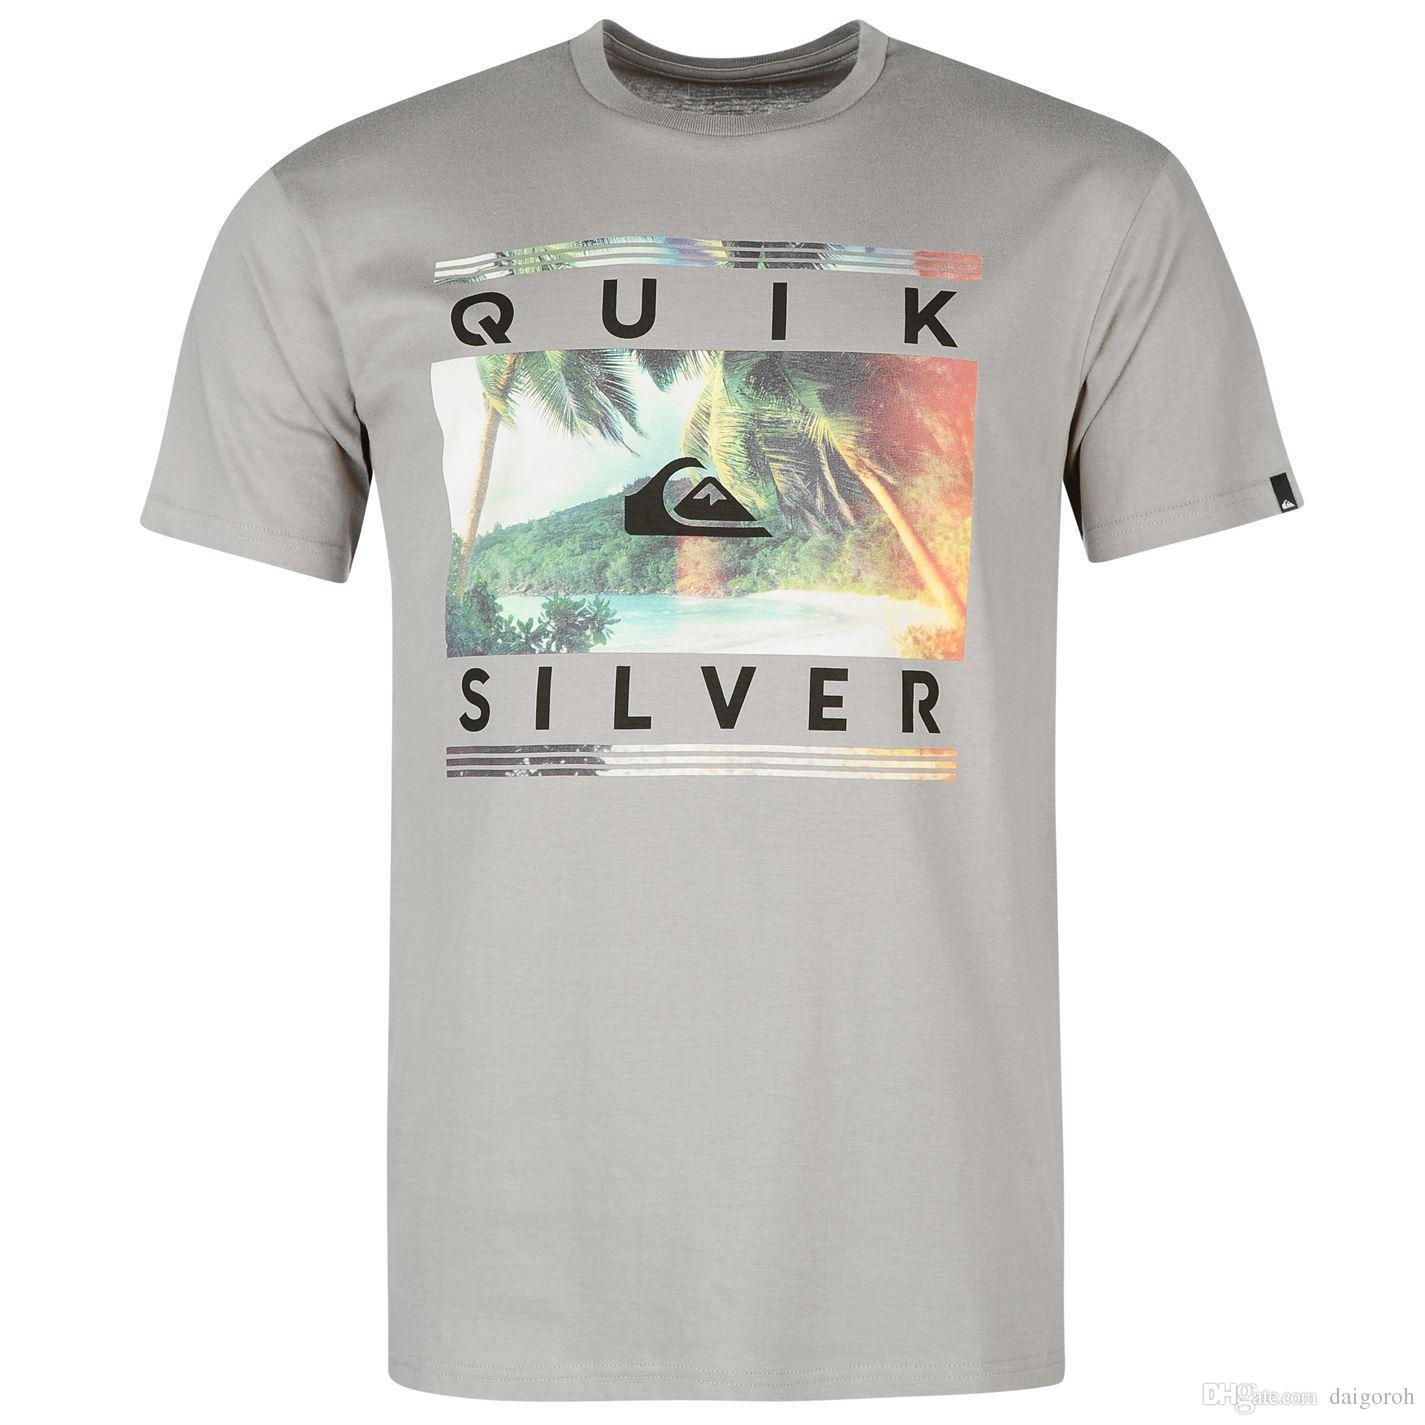 Quiksilver Good Time T-Shirt Mens Grey Casual Wear Top Tee Shirt